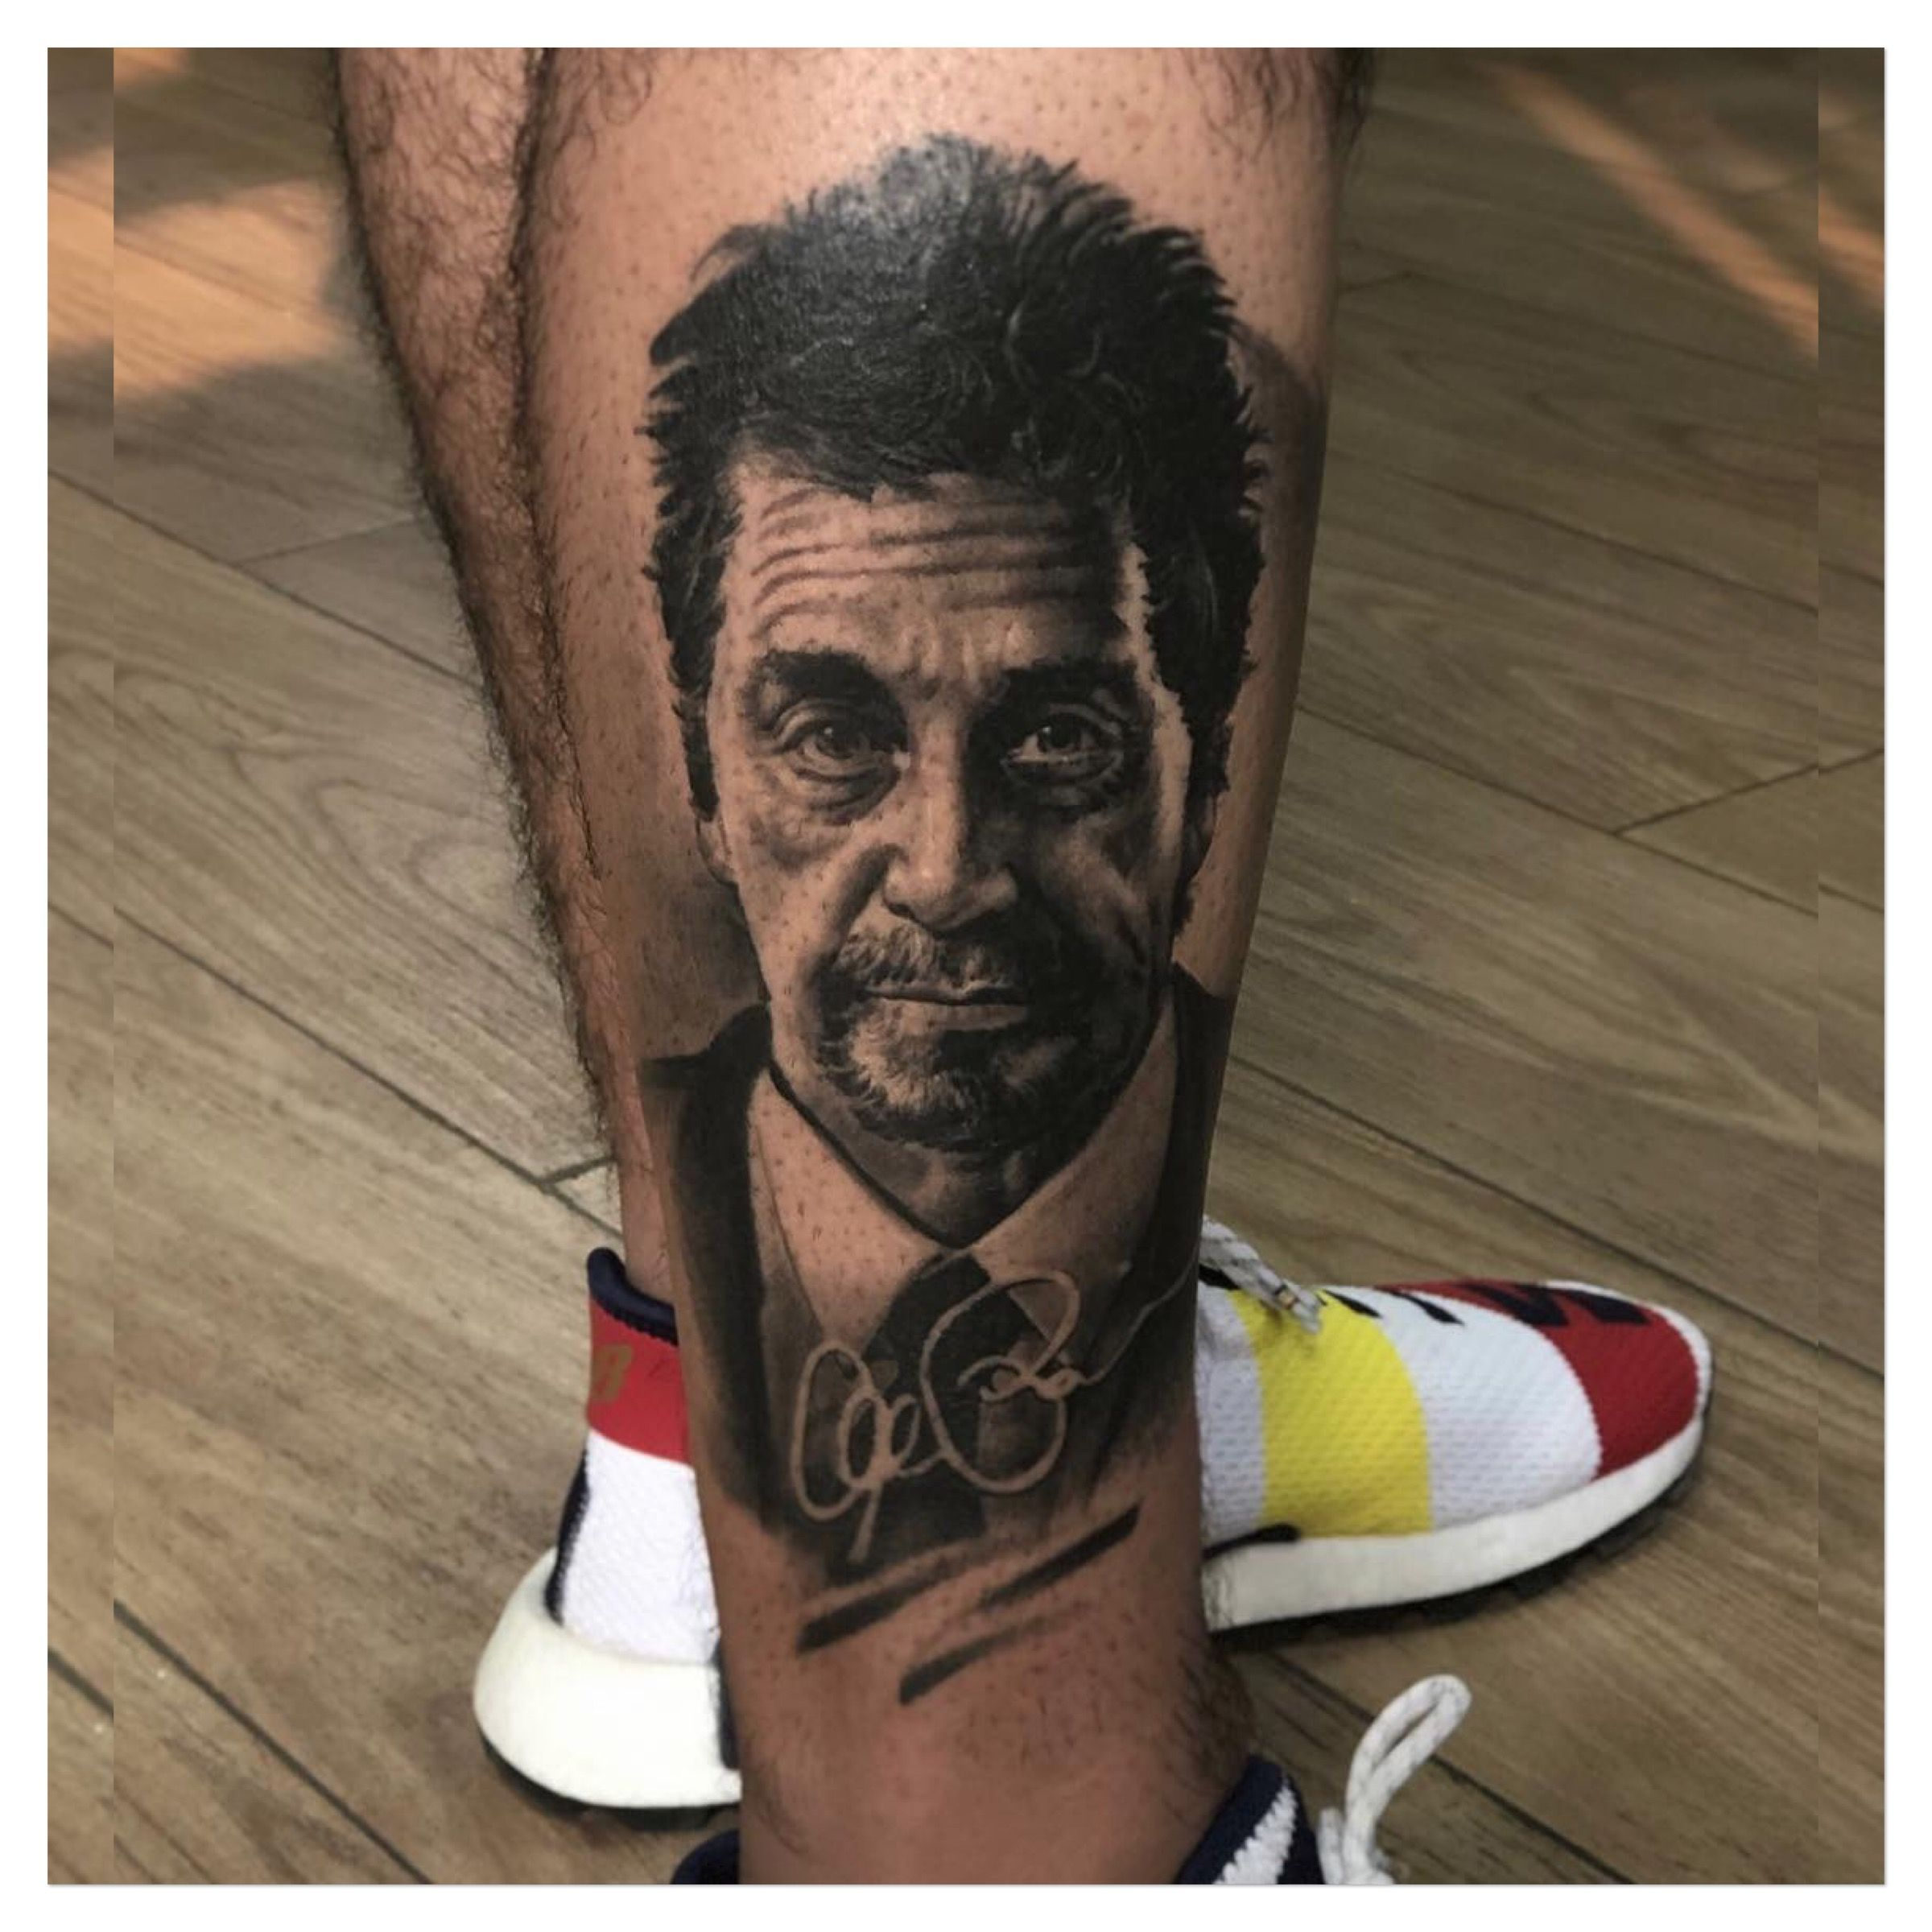 Al Pachino Tattoo Leg tattoos, Celebrity tattoos, Tattoos